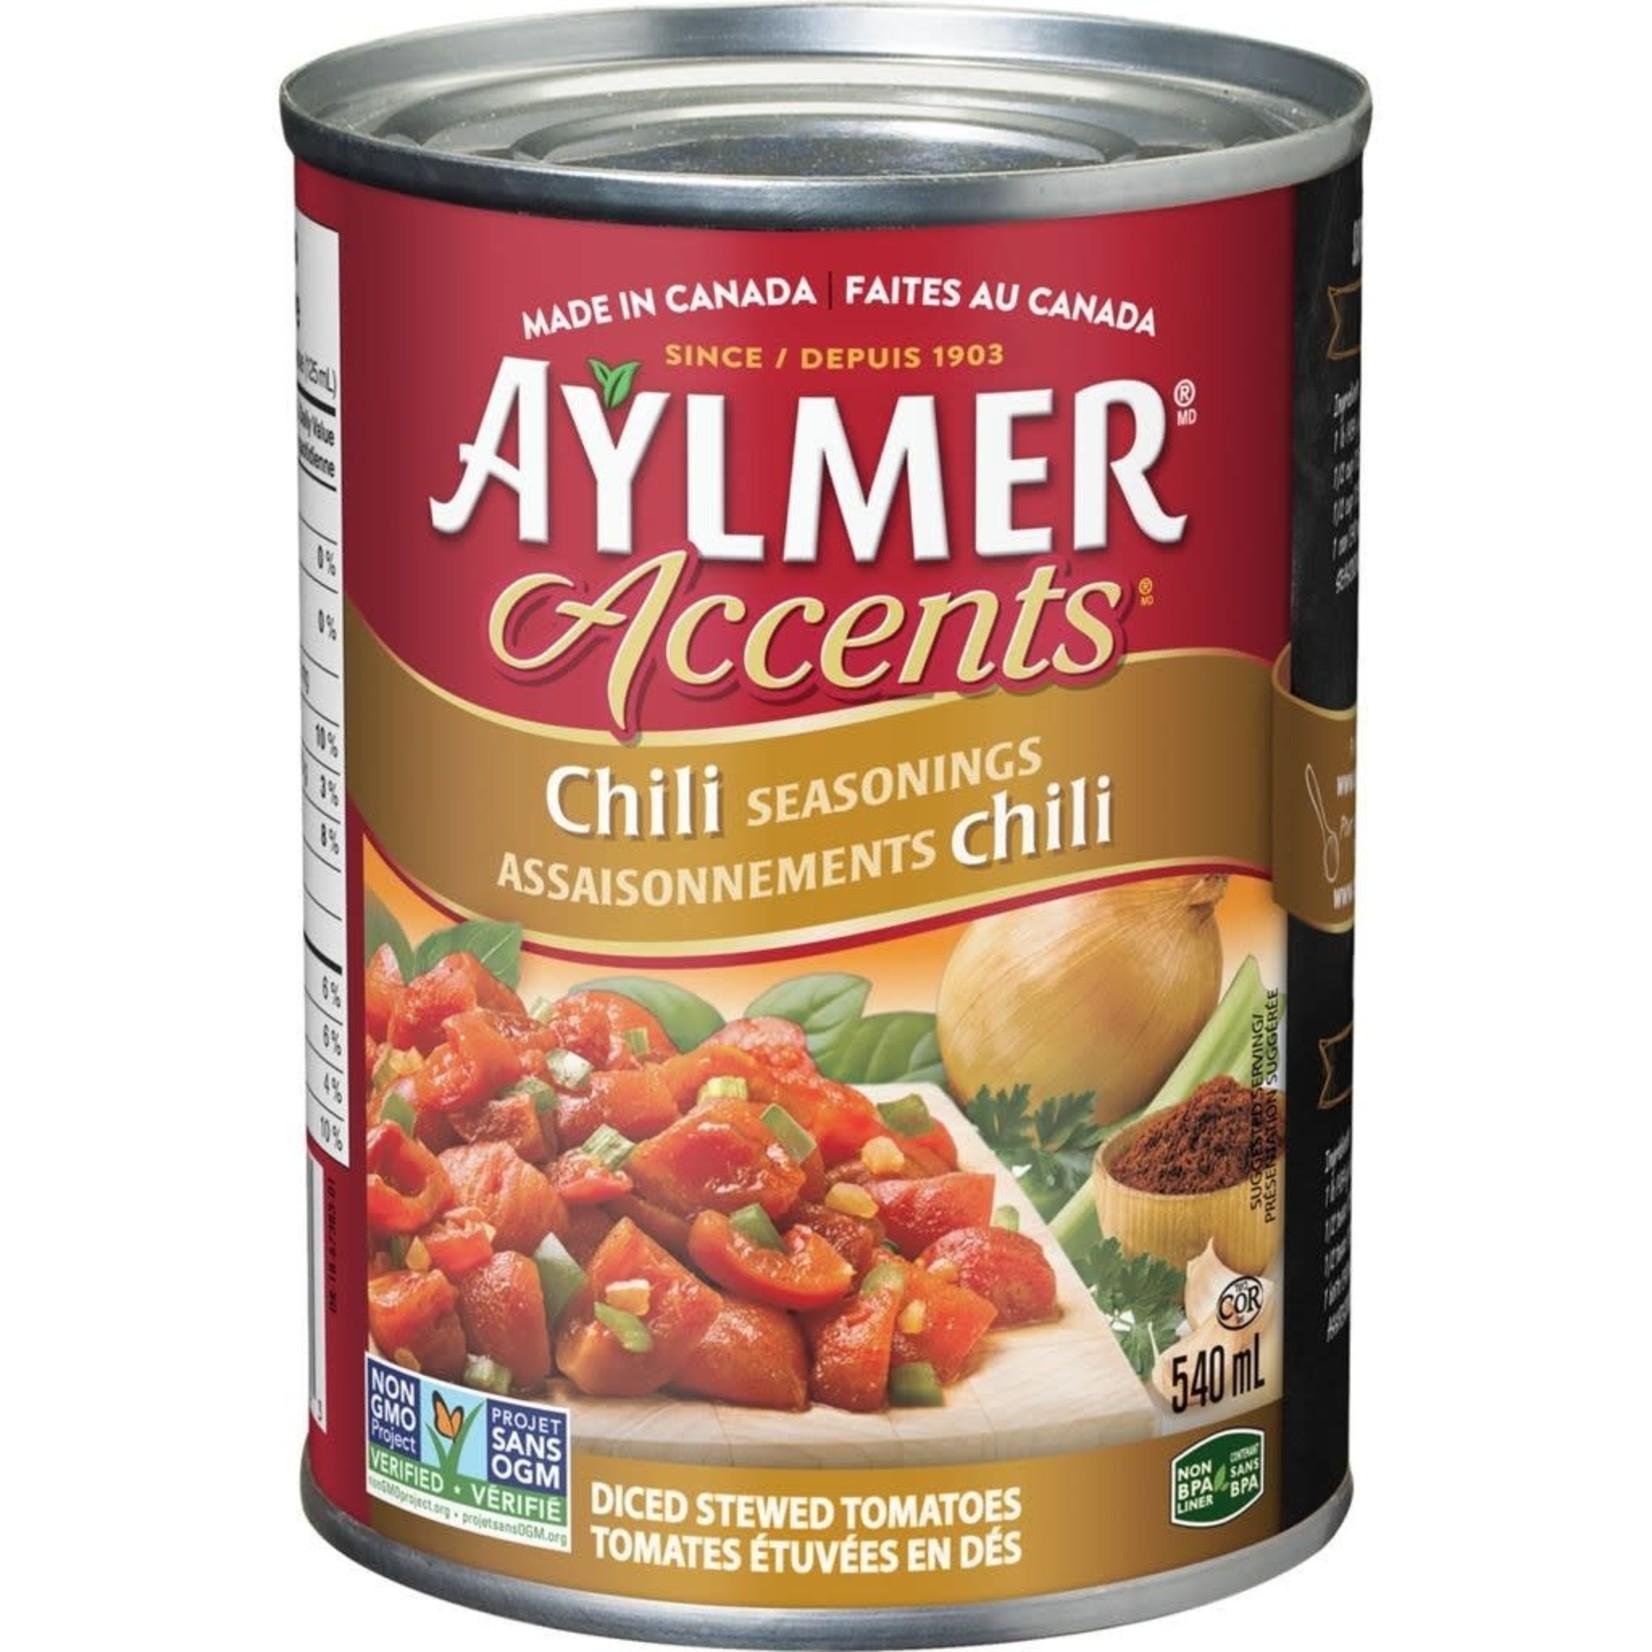 Aylmer Accents Tomatoes - Chili Seasonings 540ml